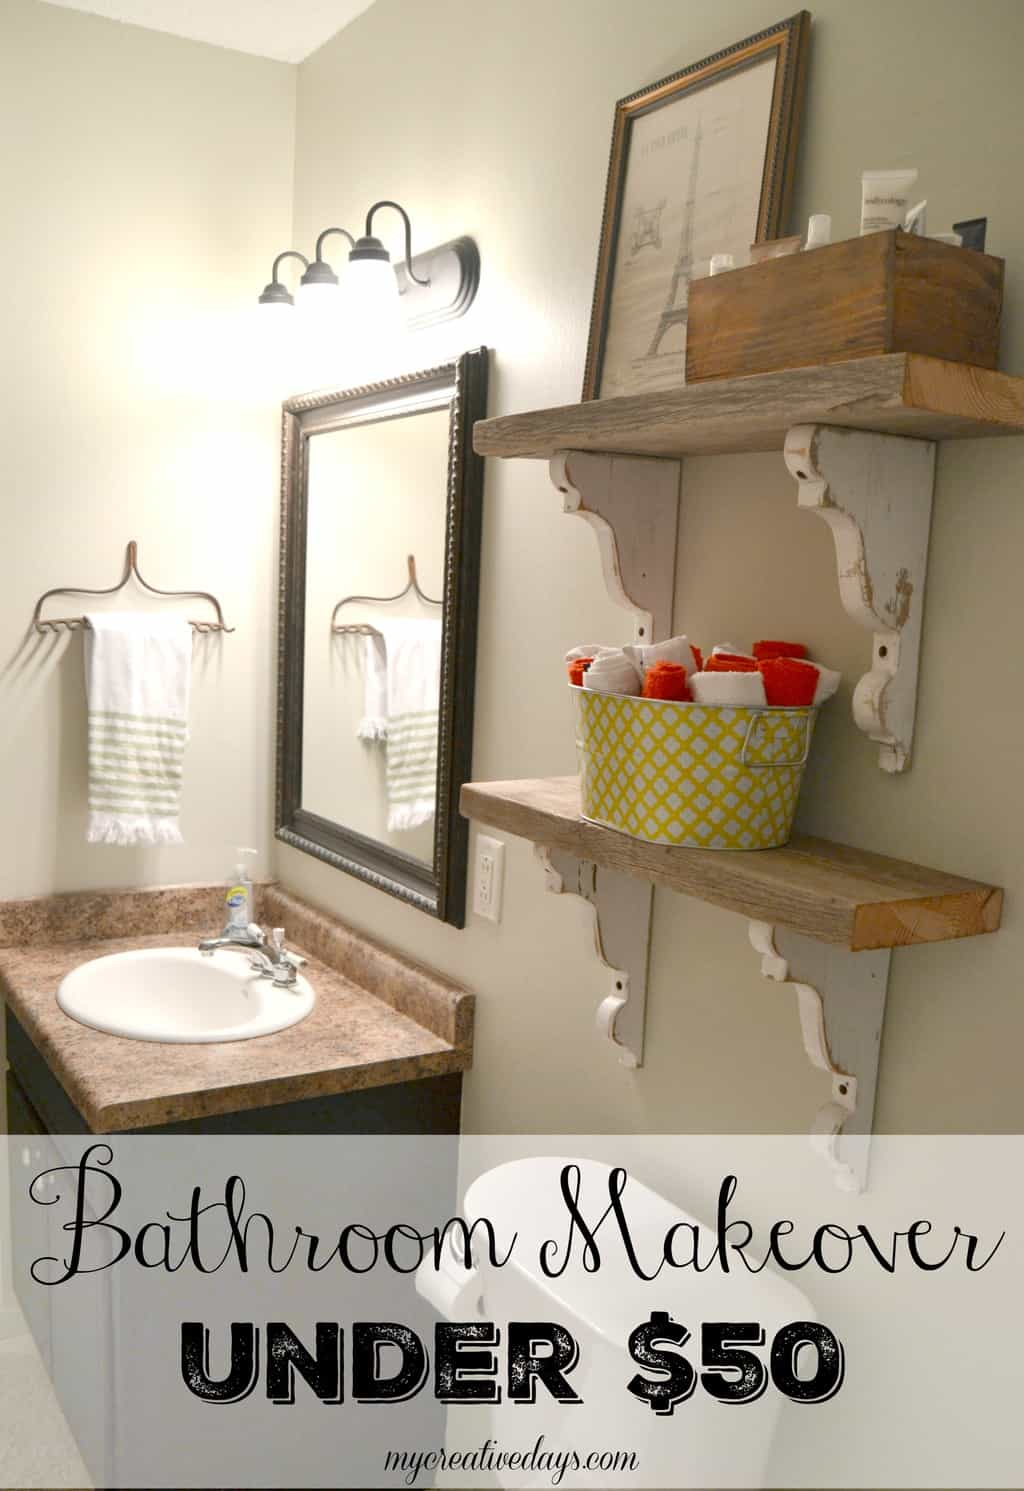 Bathroom Makeover Under  My Creative Days - Bathroom makeover